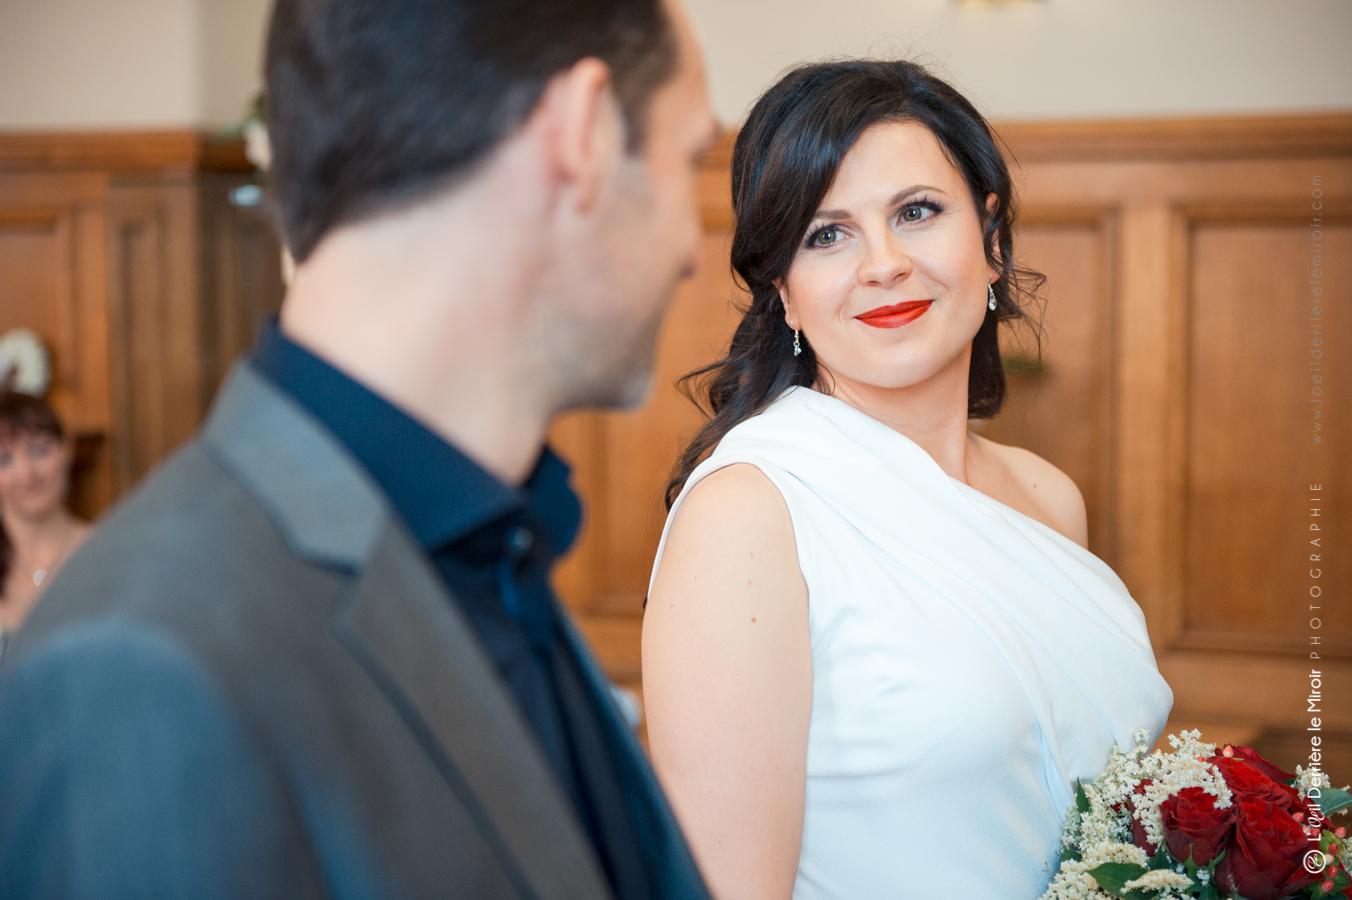 Destination-wedding-photographer-london-AG-011